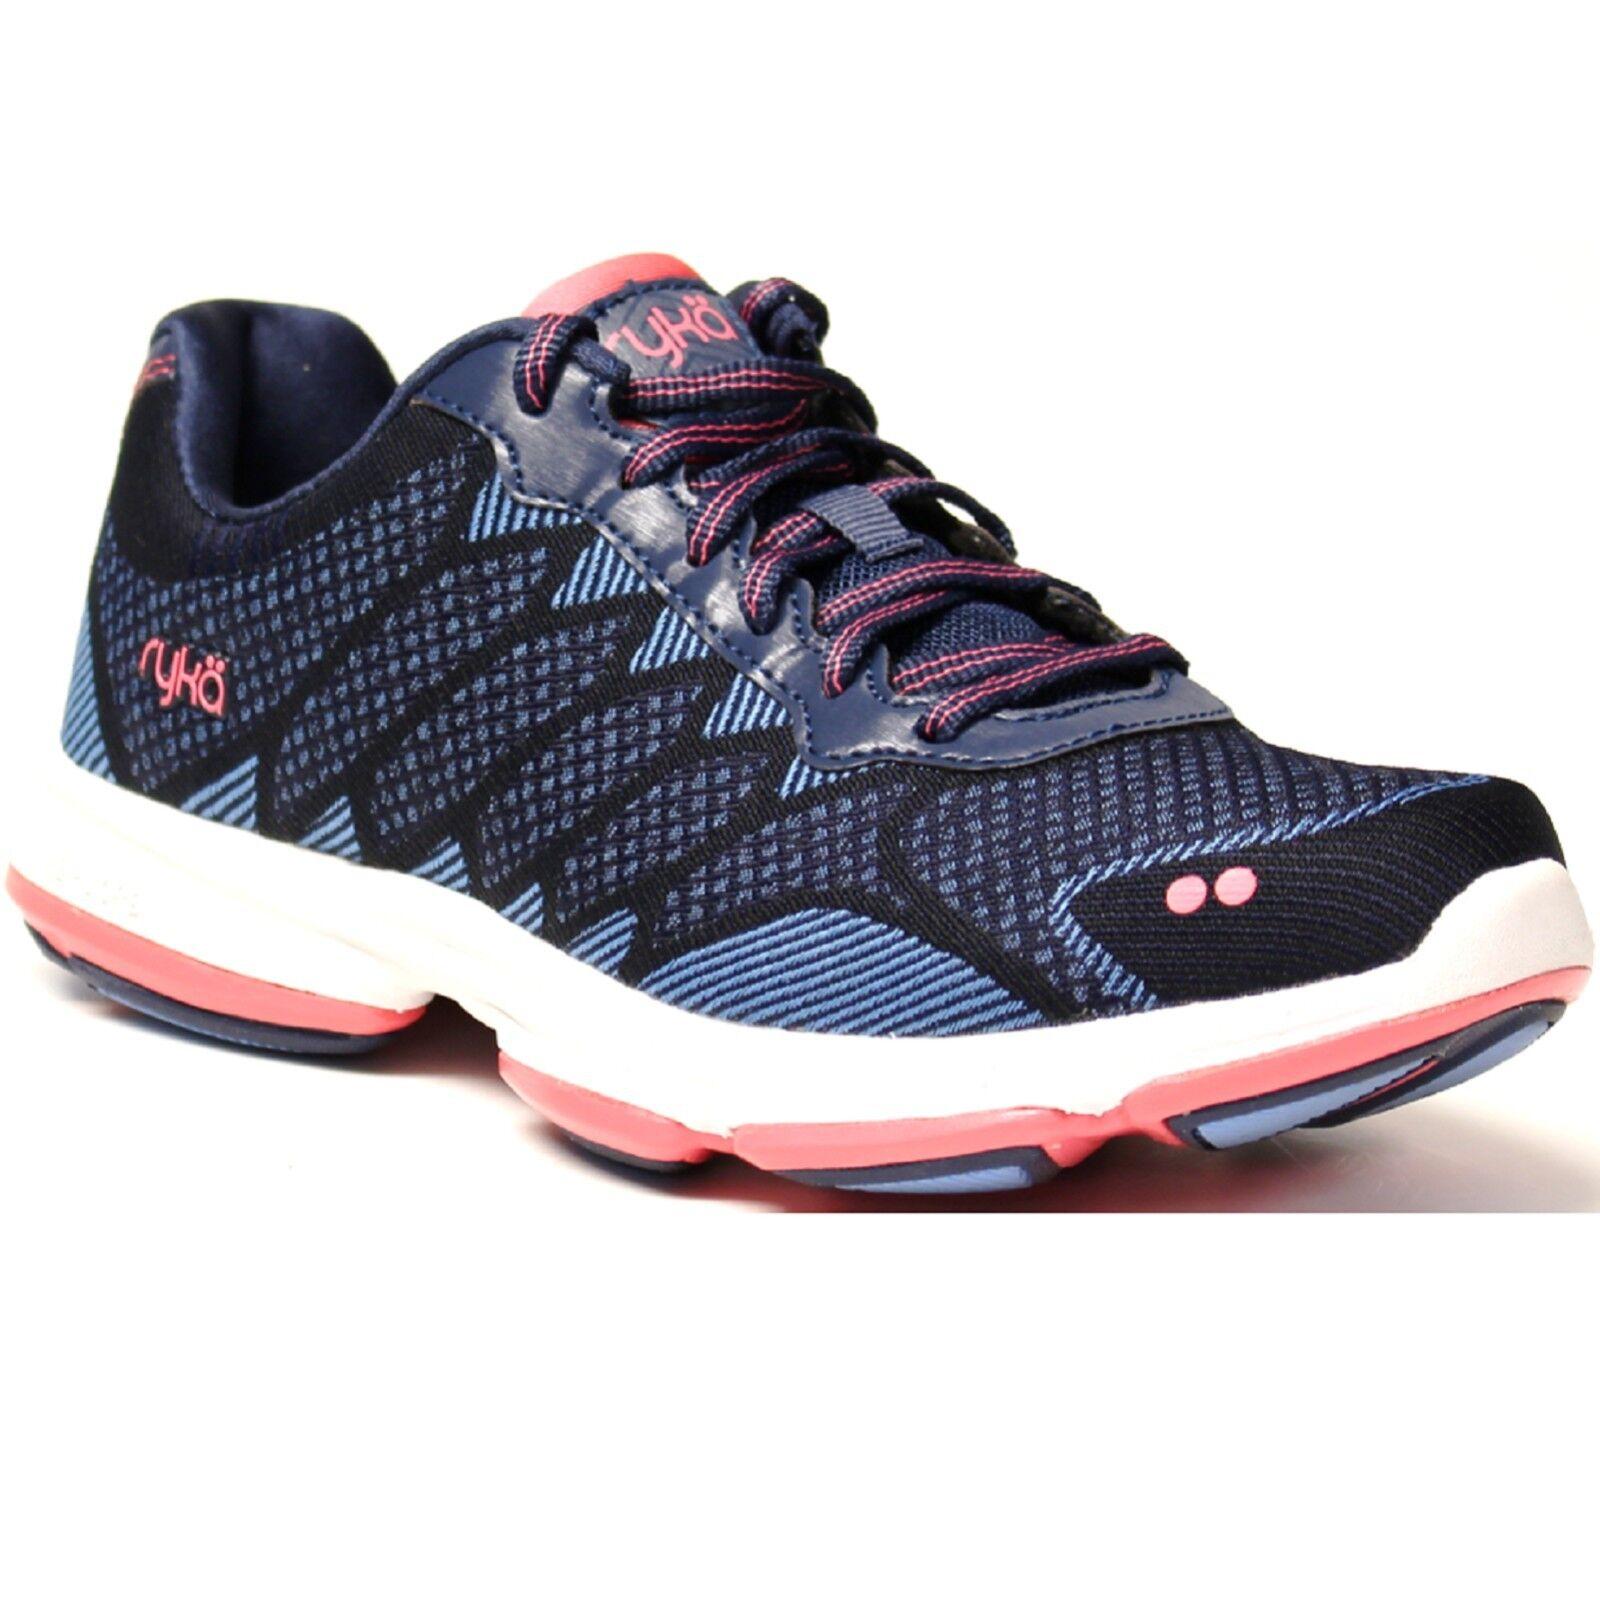 Women Ryka DOMINION E3616M1400 bluee Coral Lace-Up Walking Sneaker shoes